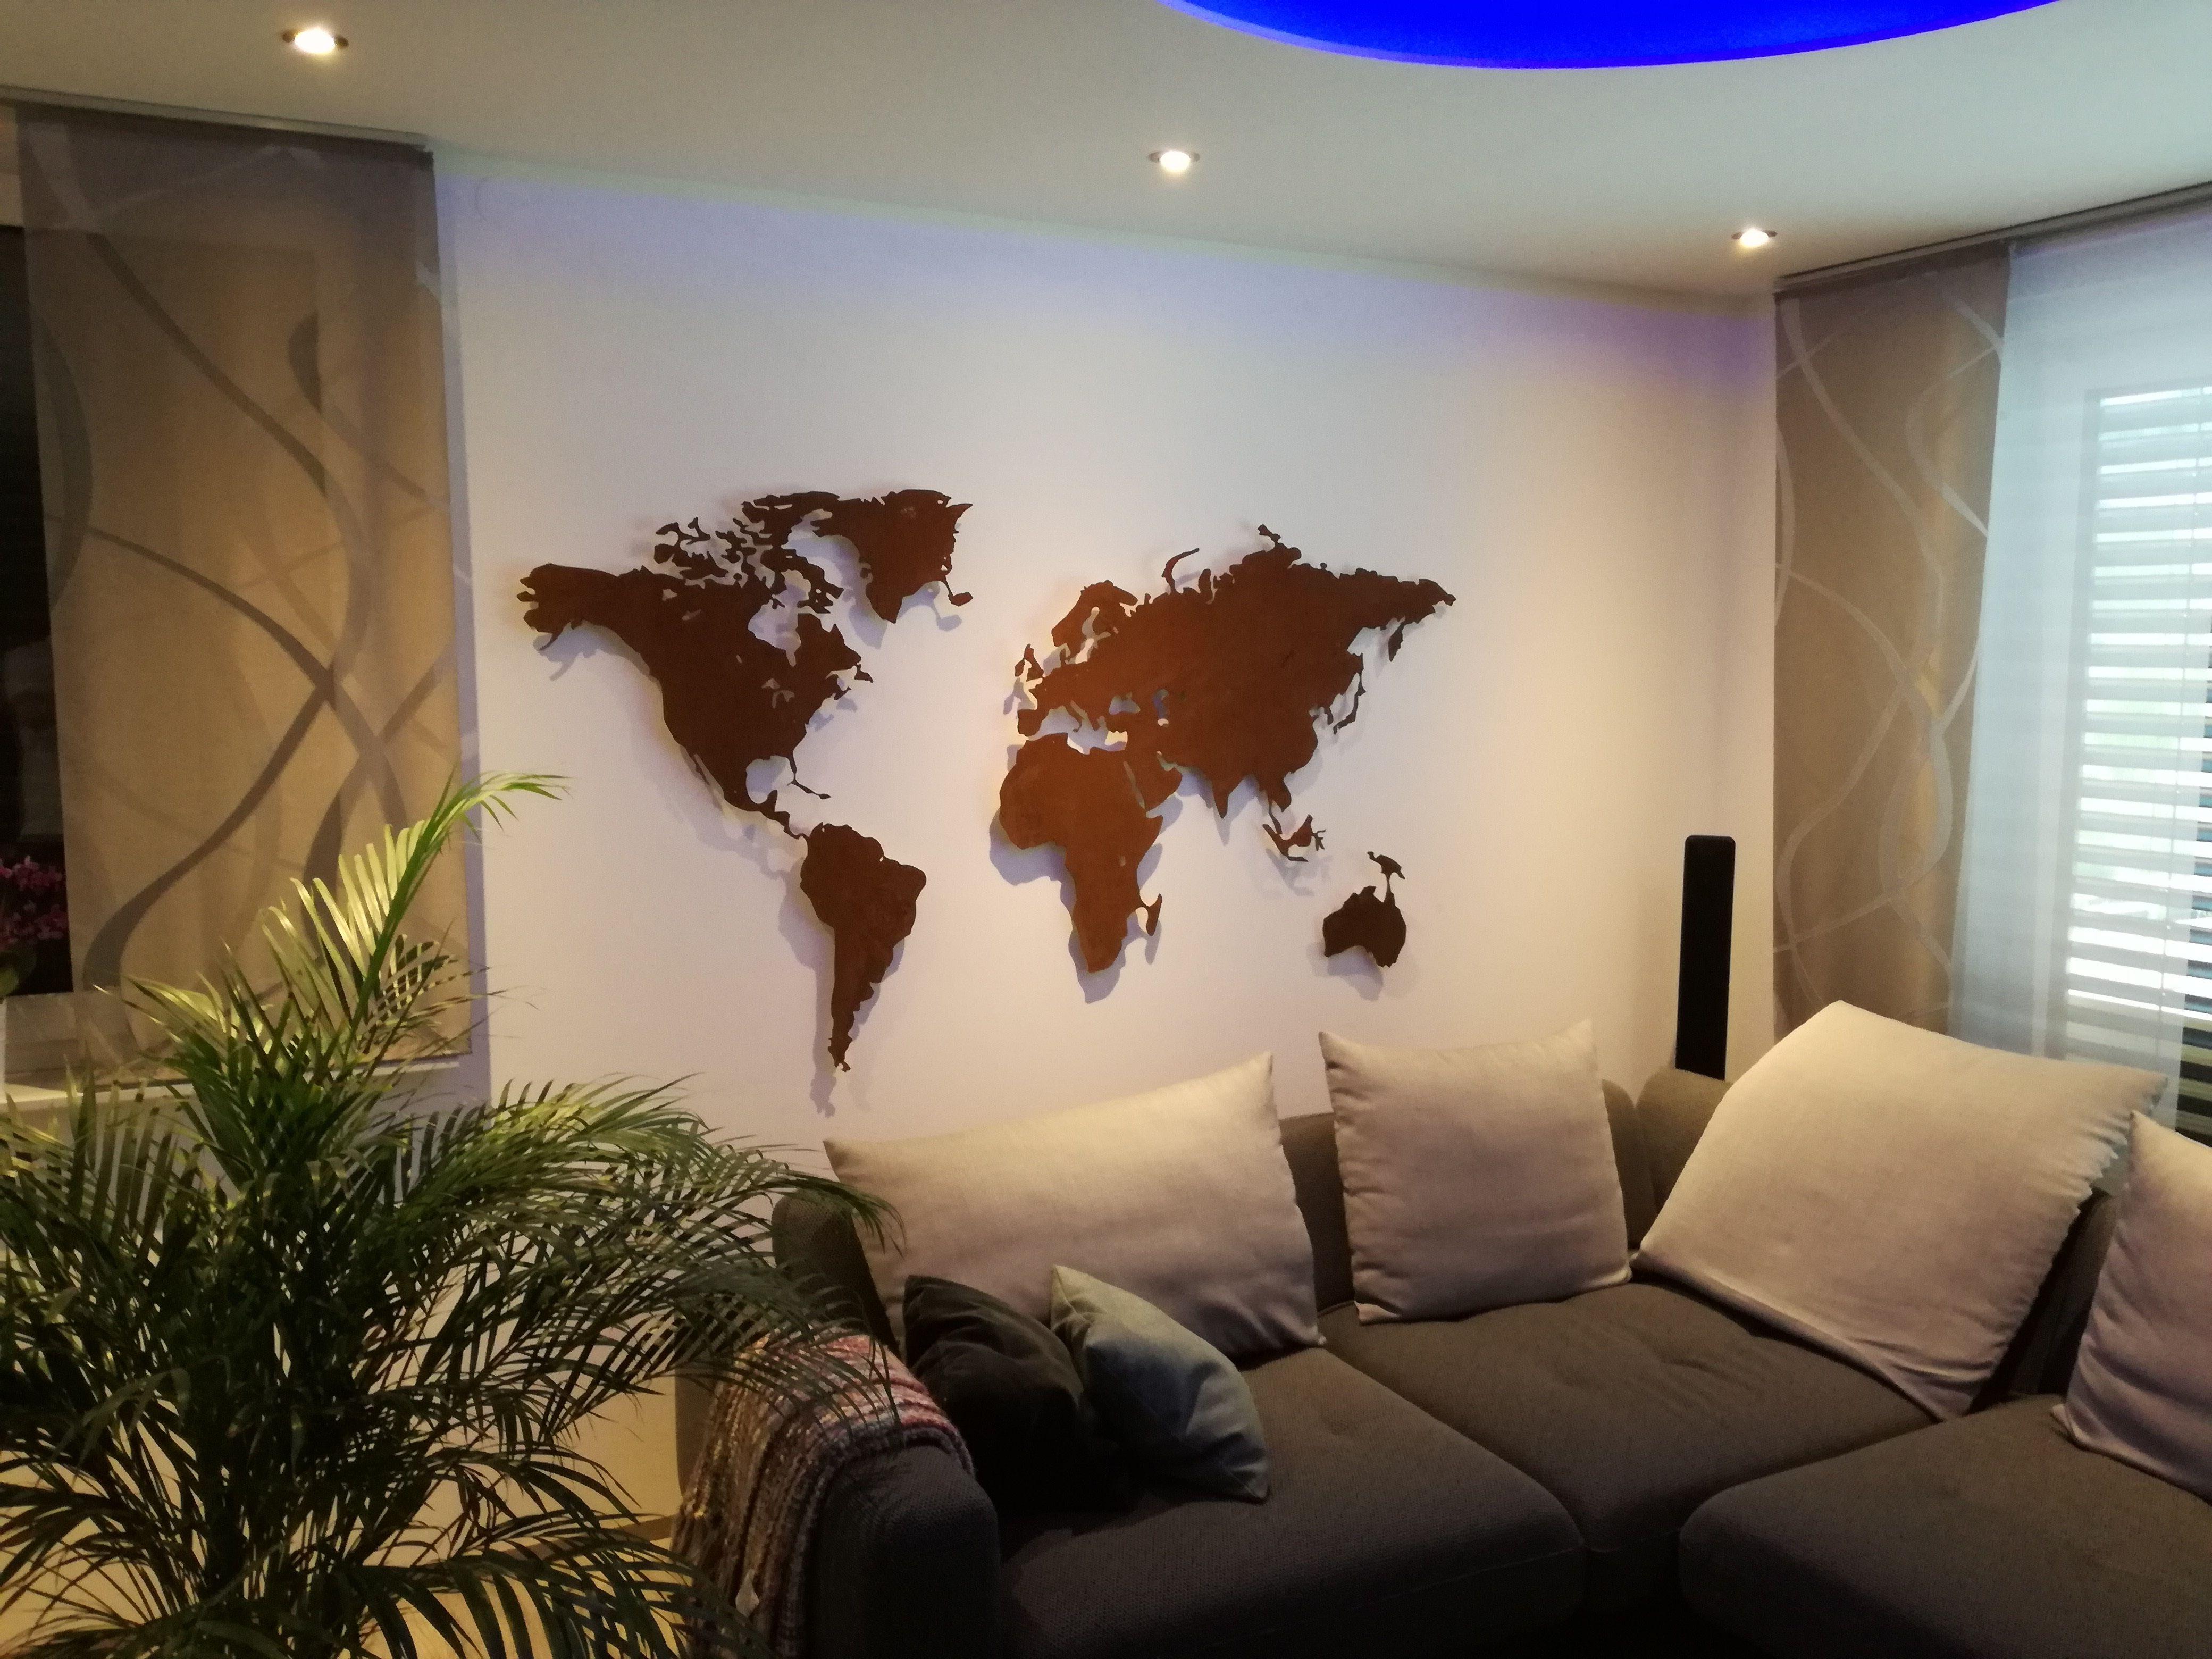 weltkarte aus stahl im rost look weltkarten f r die wand by pinterest. Black Bedroom Furniture Sets. Home Design Ideas